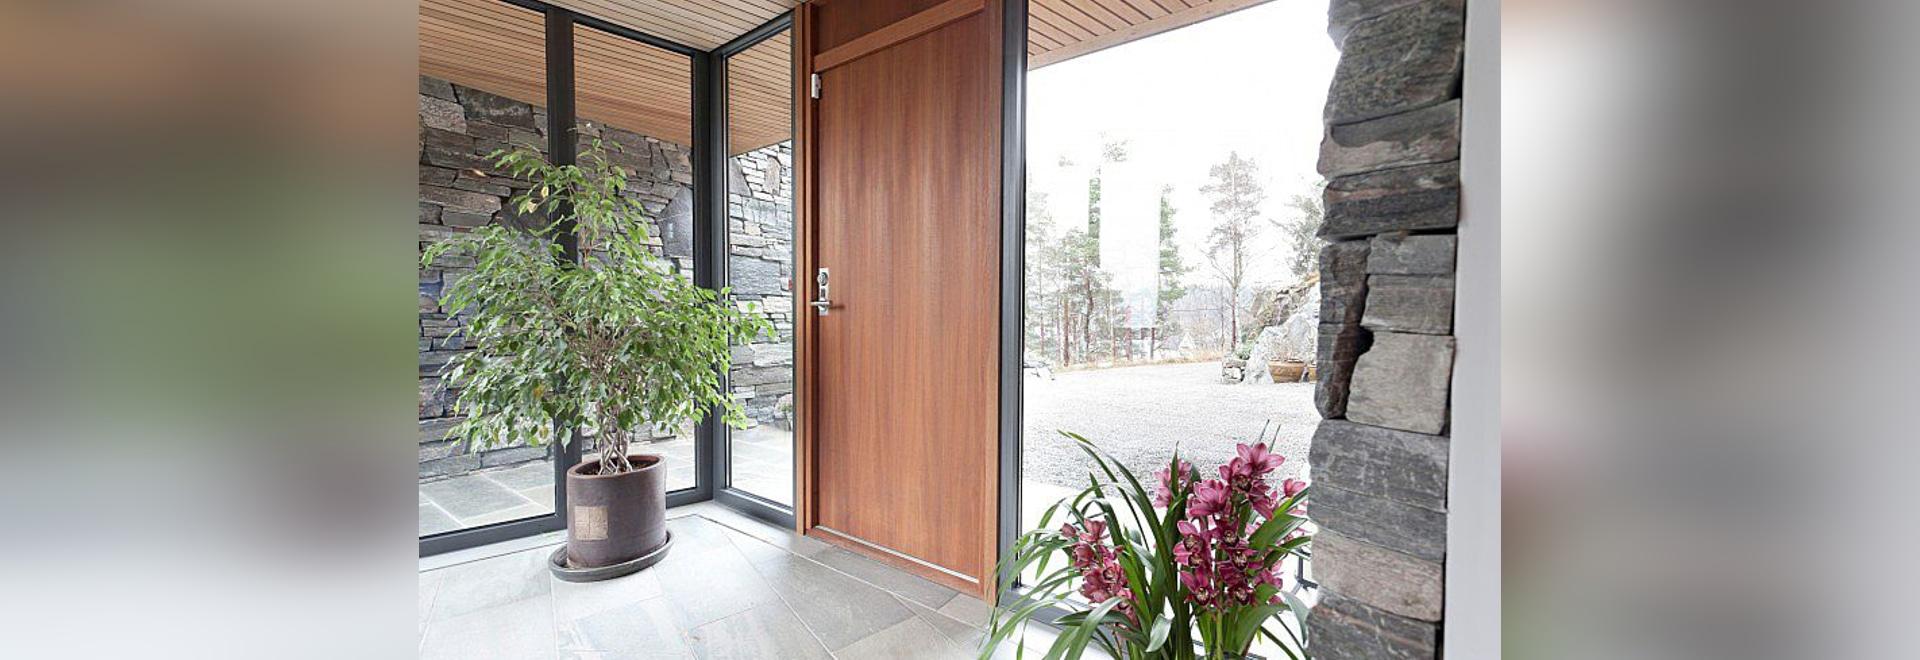 FSC wood entrance doors-Bovalls & FSC wood entrance doors-Bovalls - BOVALLS